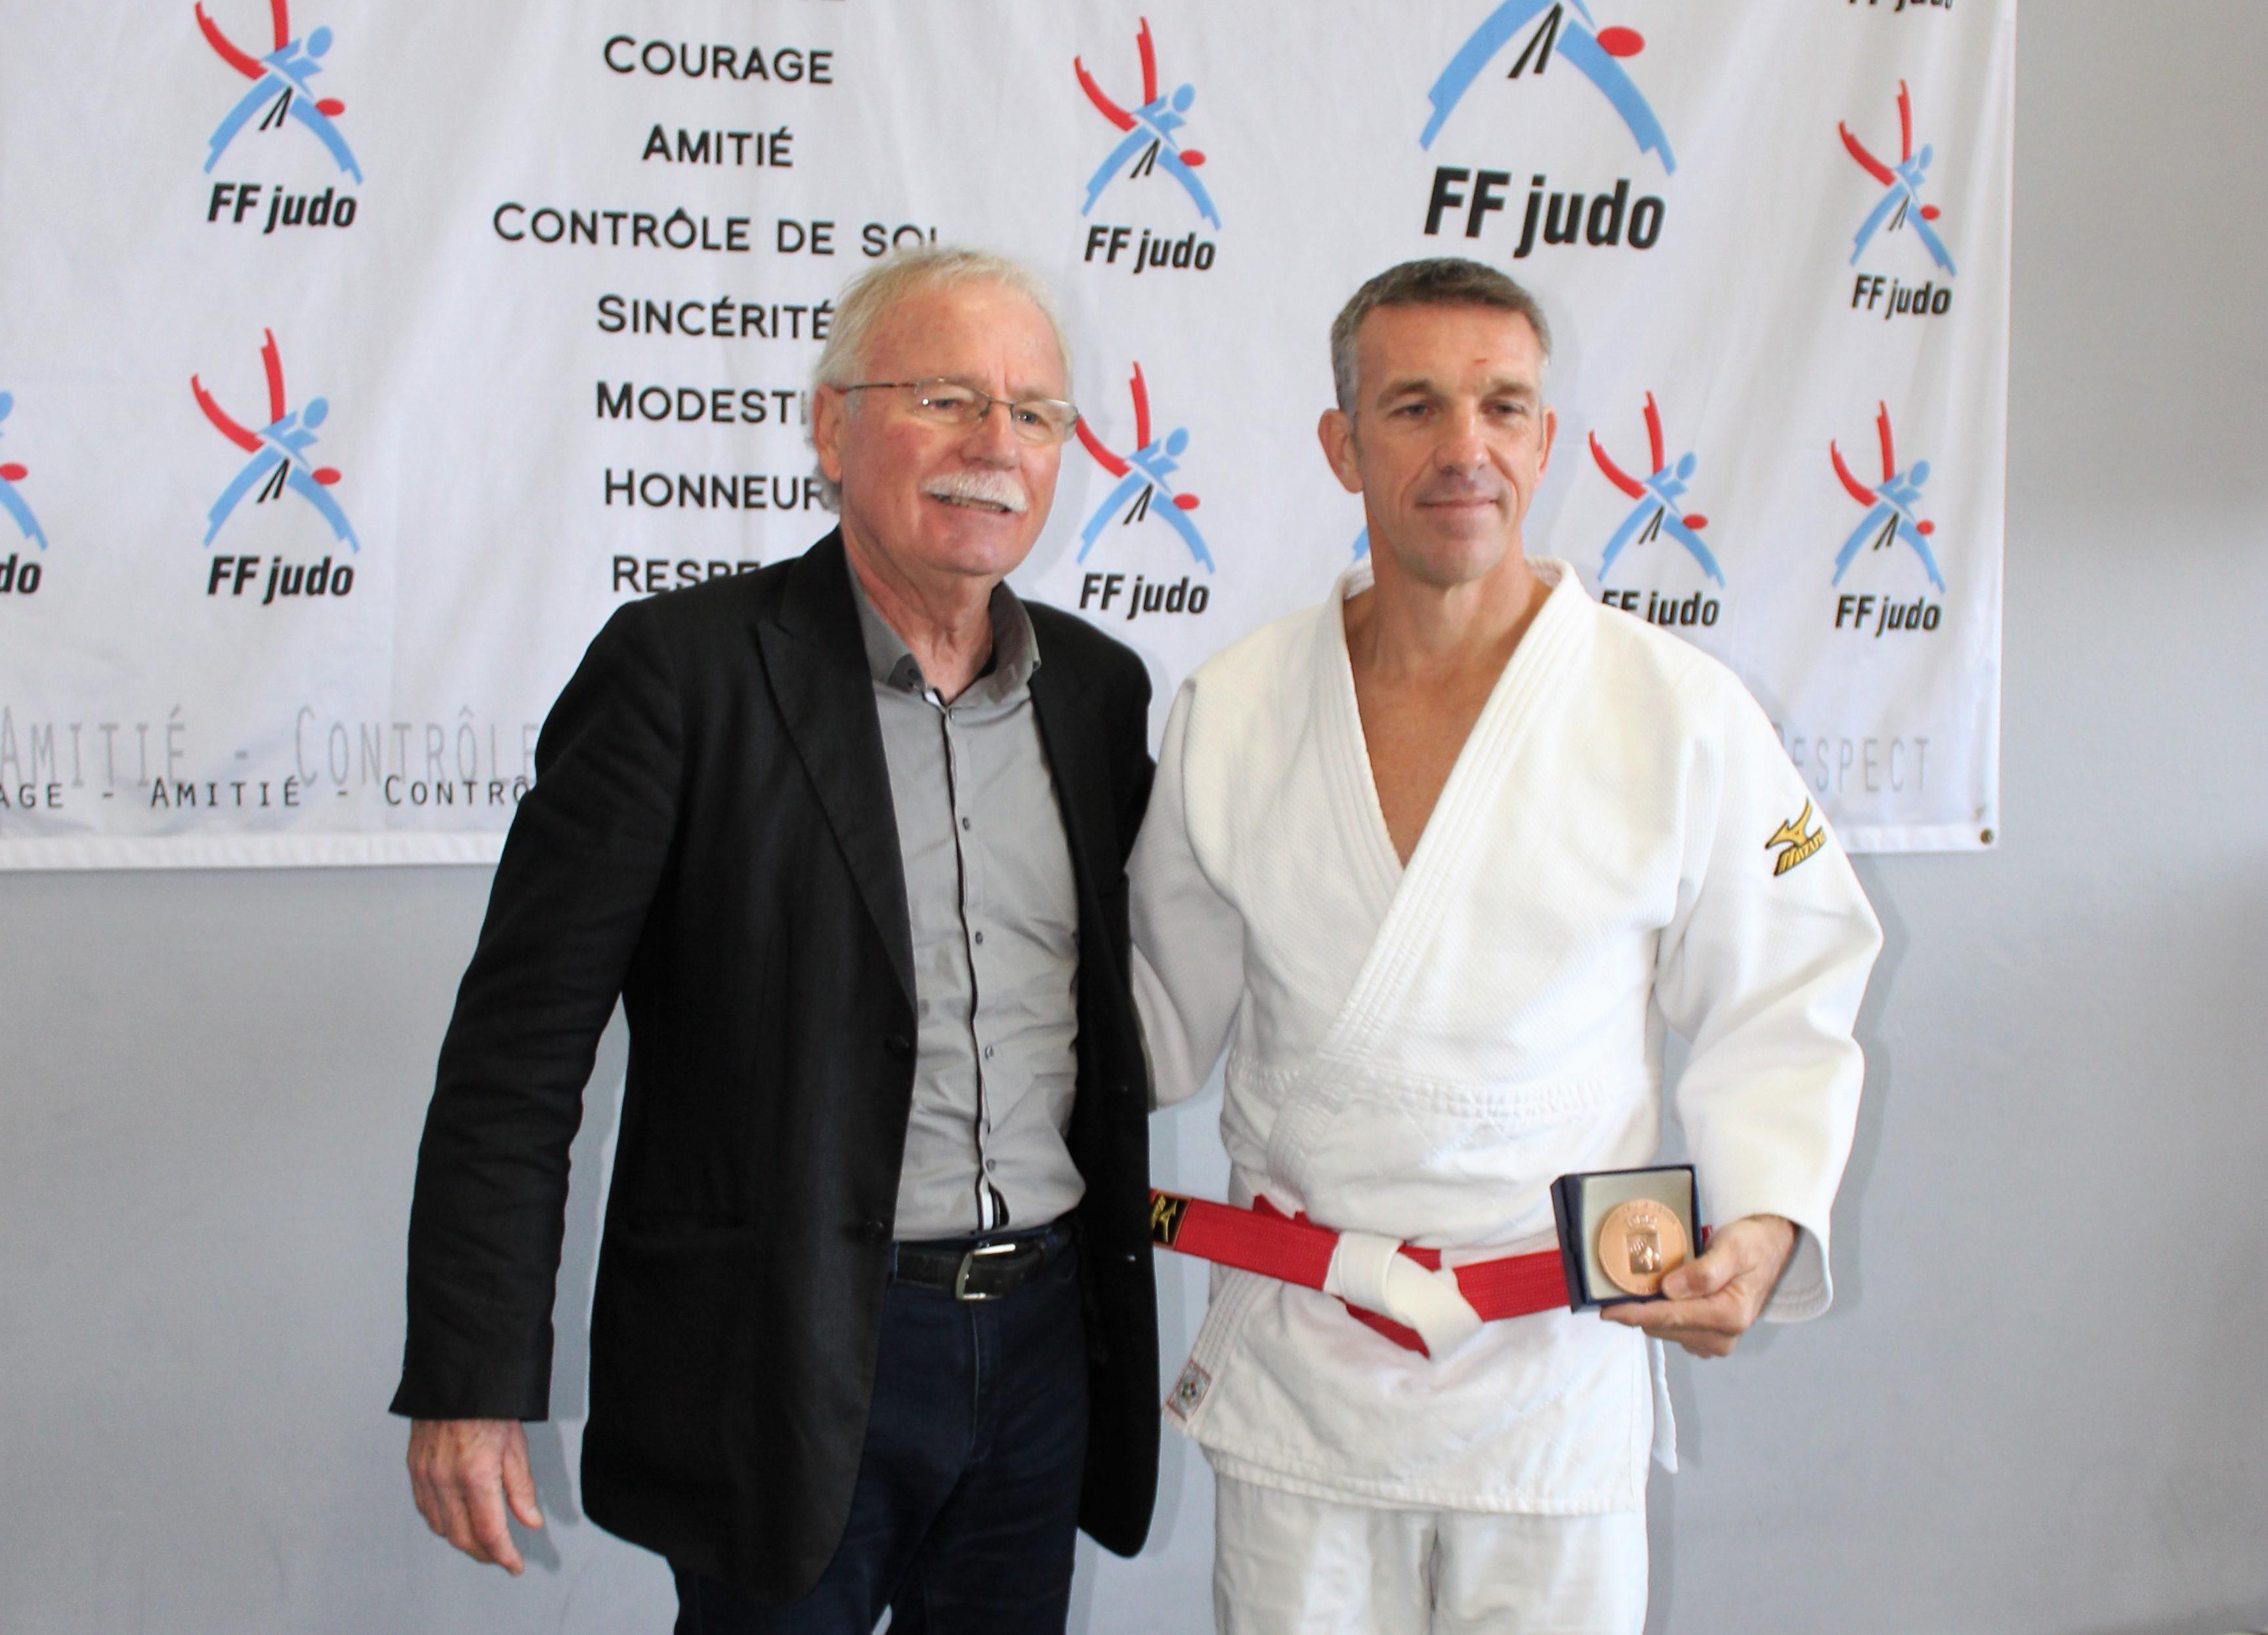 Un 6e Dan pour Thierry Geslin du Judo Club de Lisula